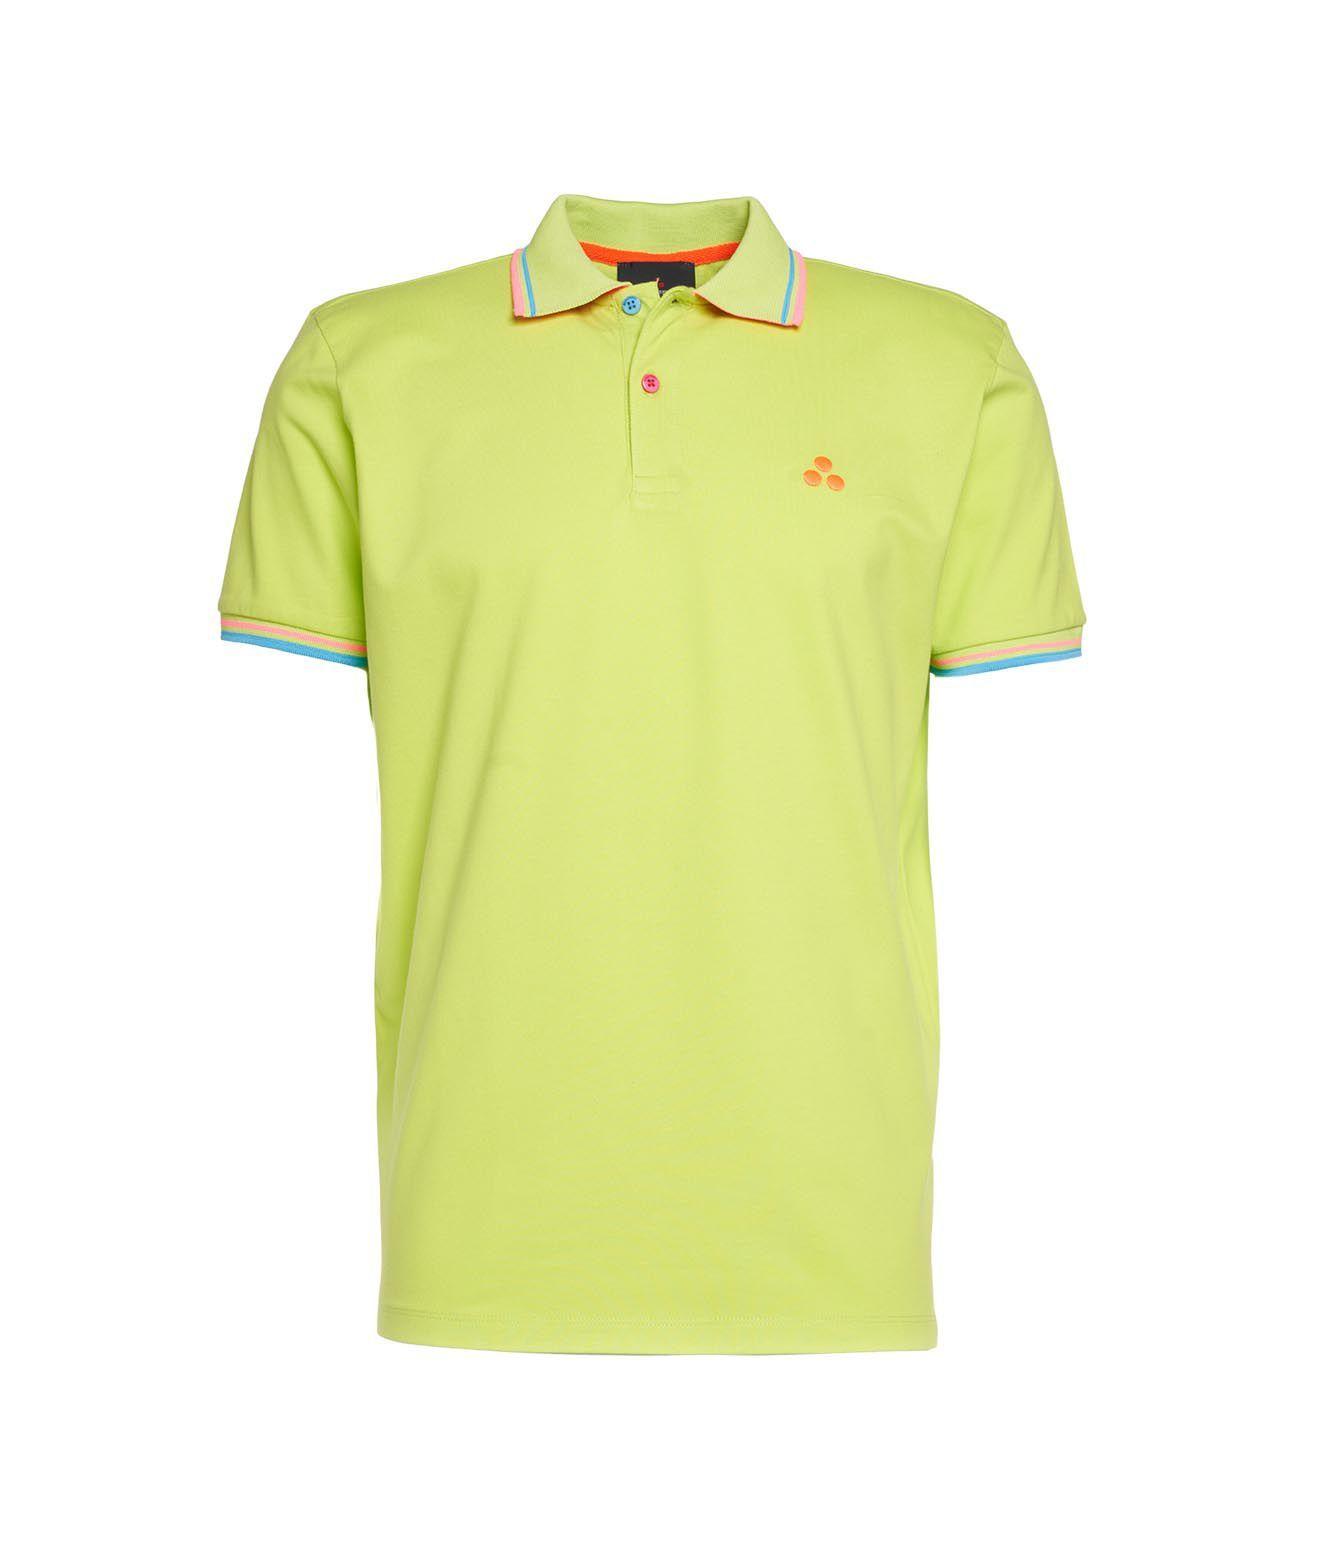 Peuterey Shirts PEUTEREY MEN'S GREEN OTHER MATERIALS POLO SHIRT